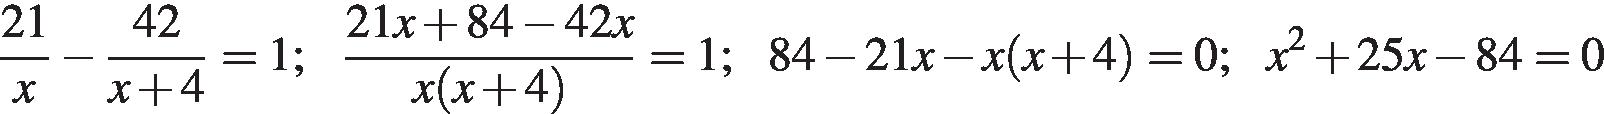 http://sdamgia.ru/formula/92/92a8b38cfa9e98a050d843ad66a365d8p.png